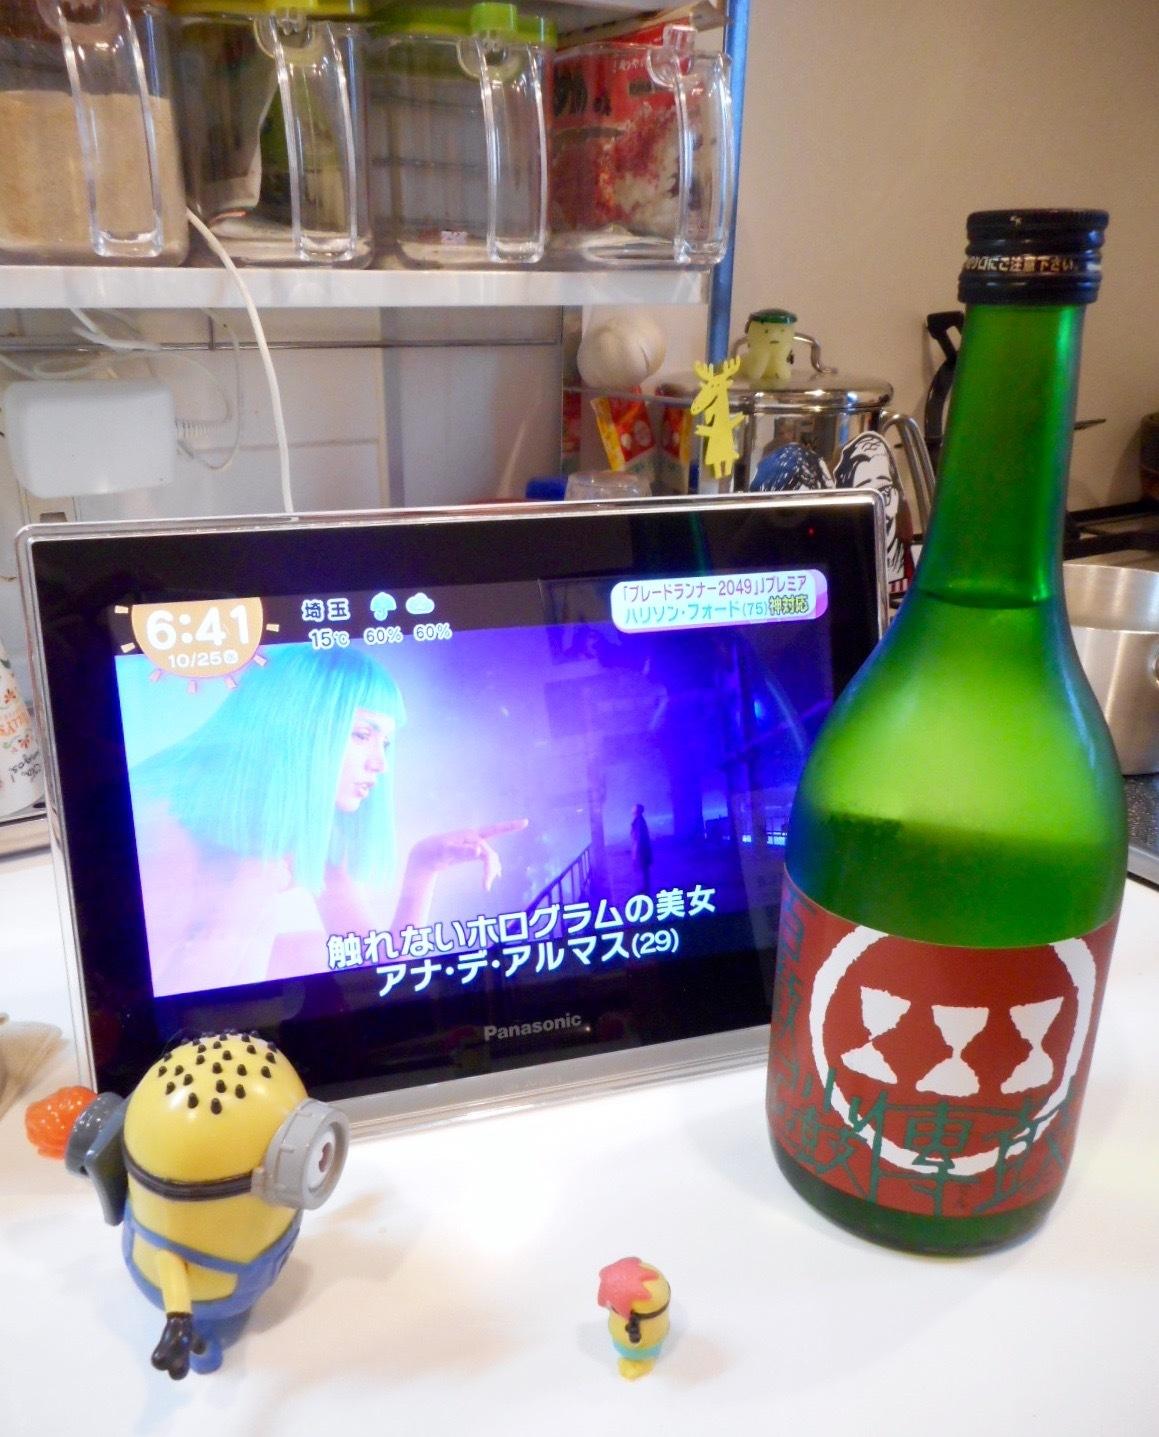 kozutsumi_koden28by3.jpg